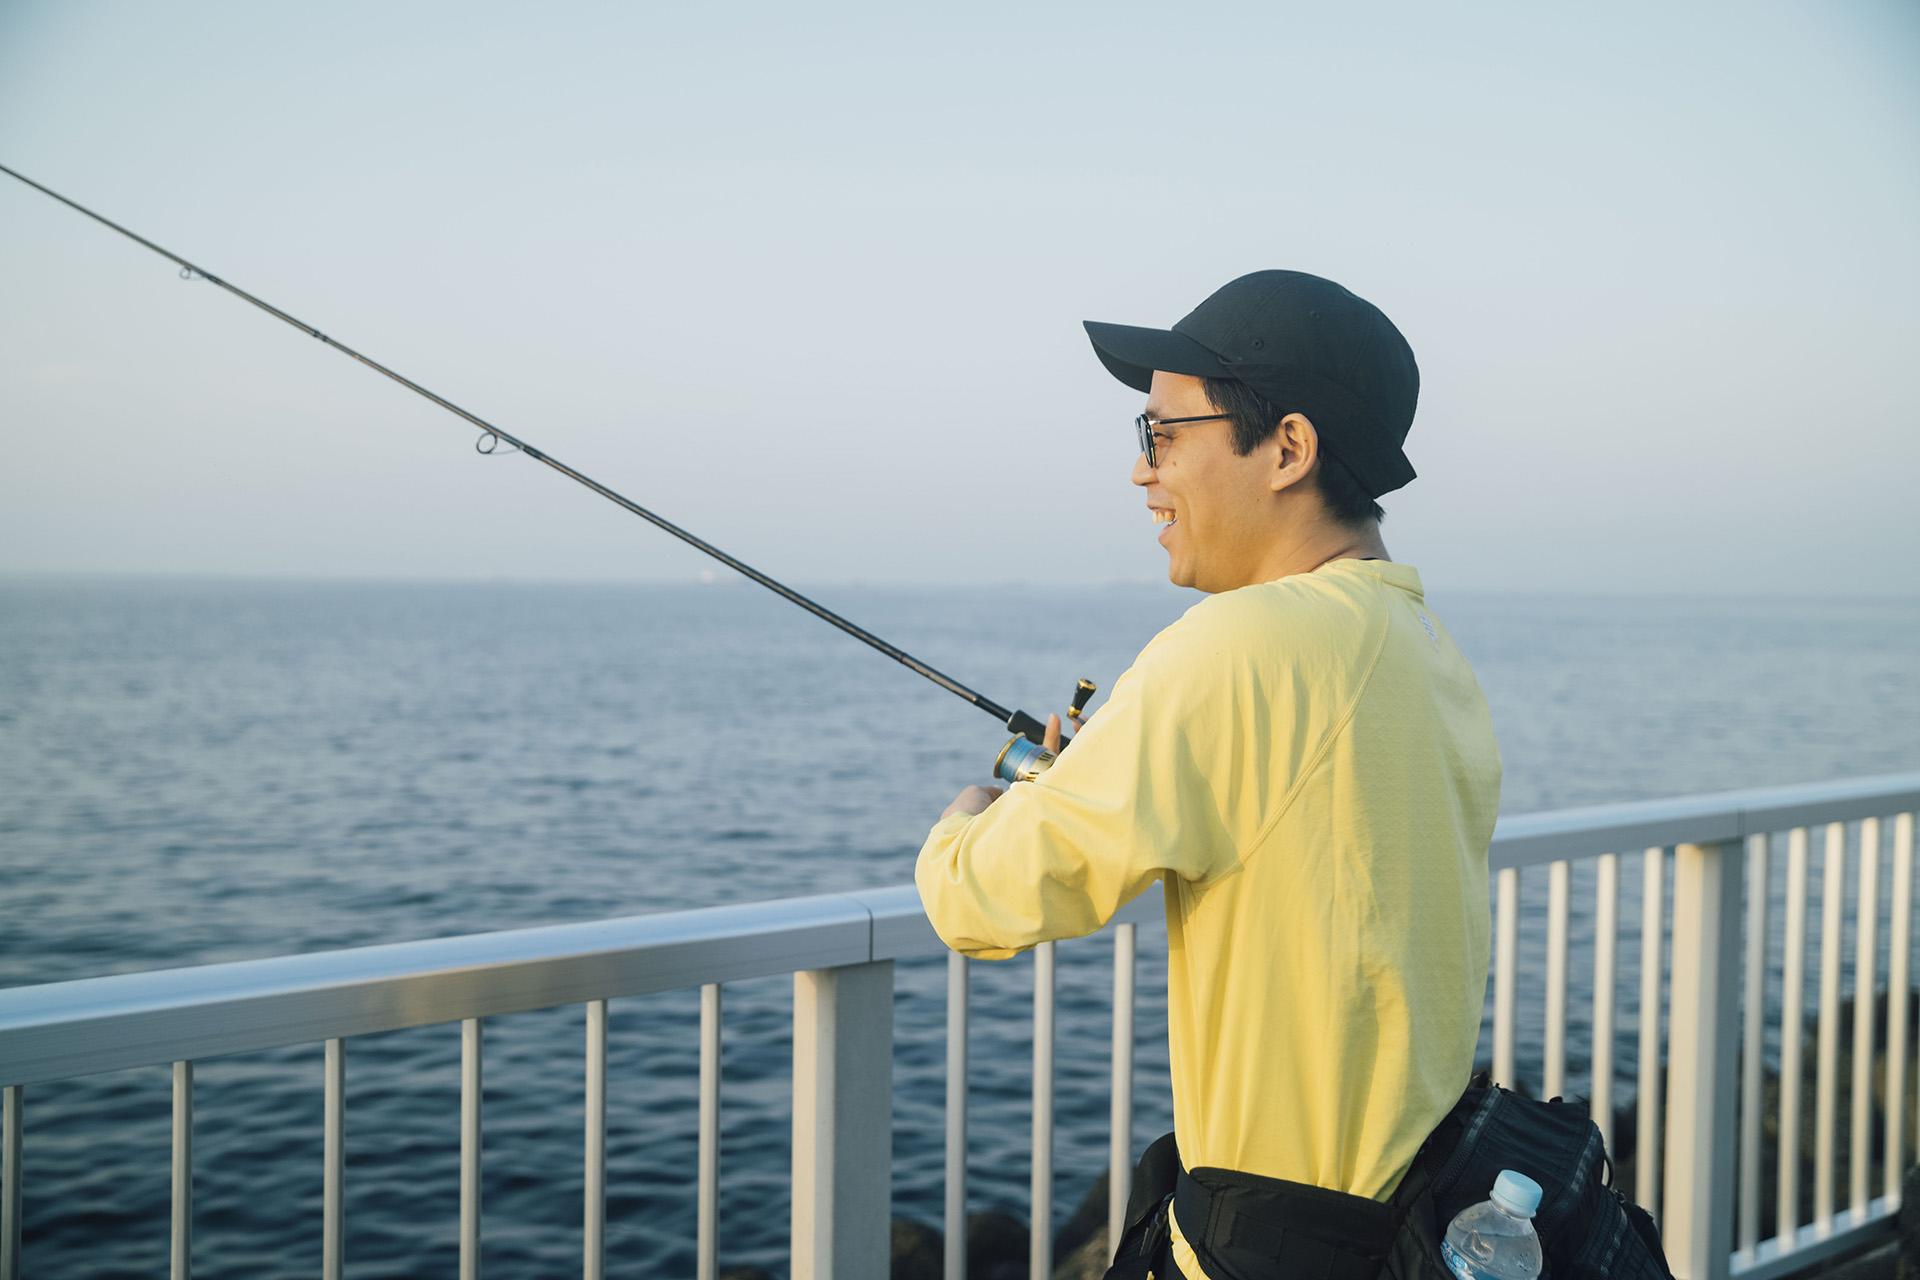 4 Yogee New Waves・粕谷哲司の音楽と釣りを愛するライフスタイル